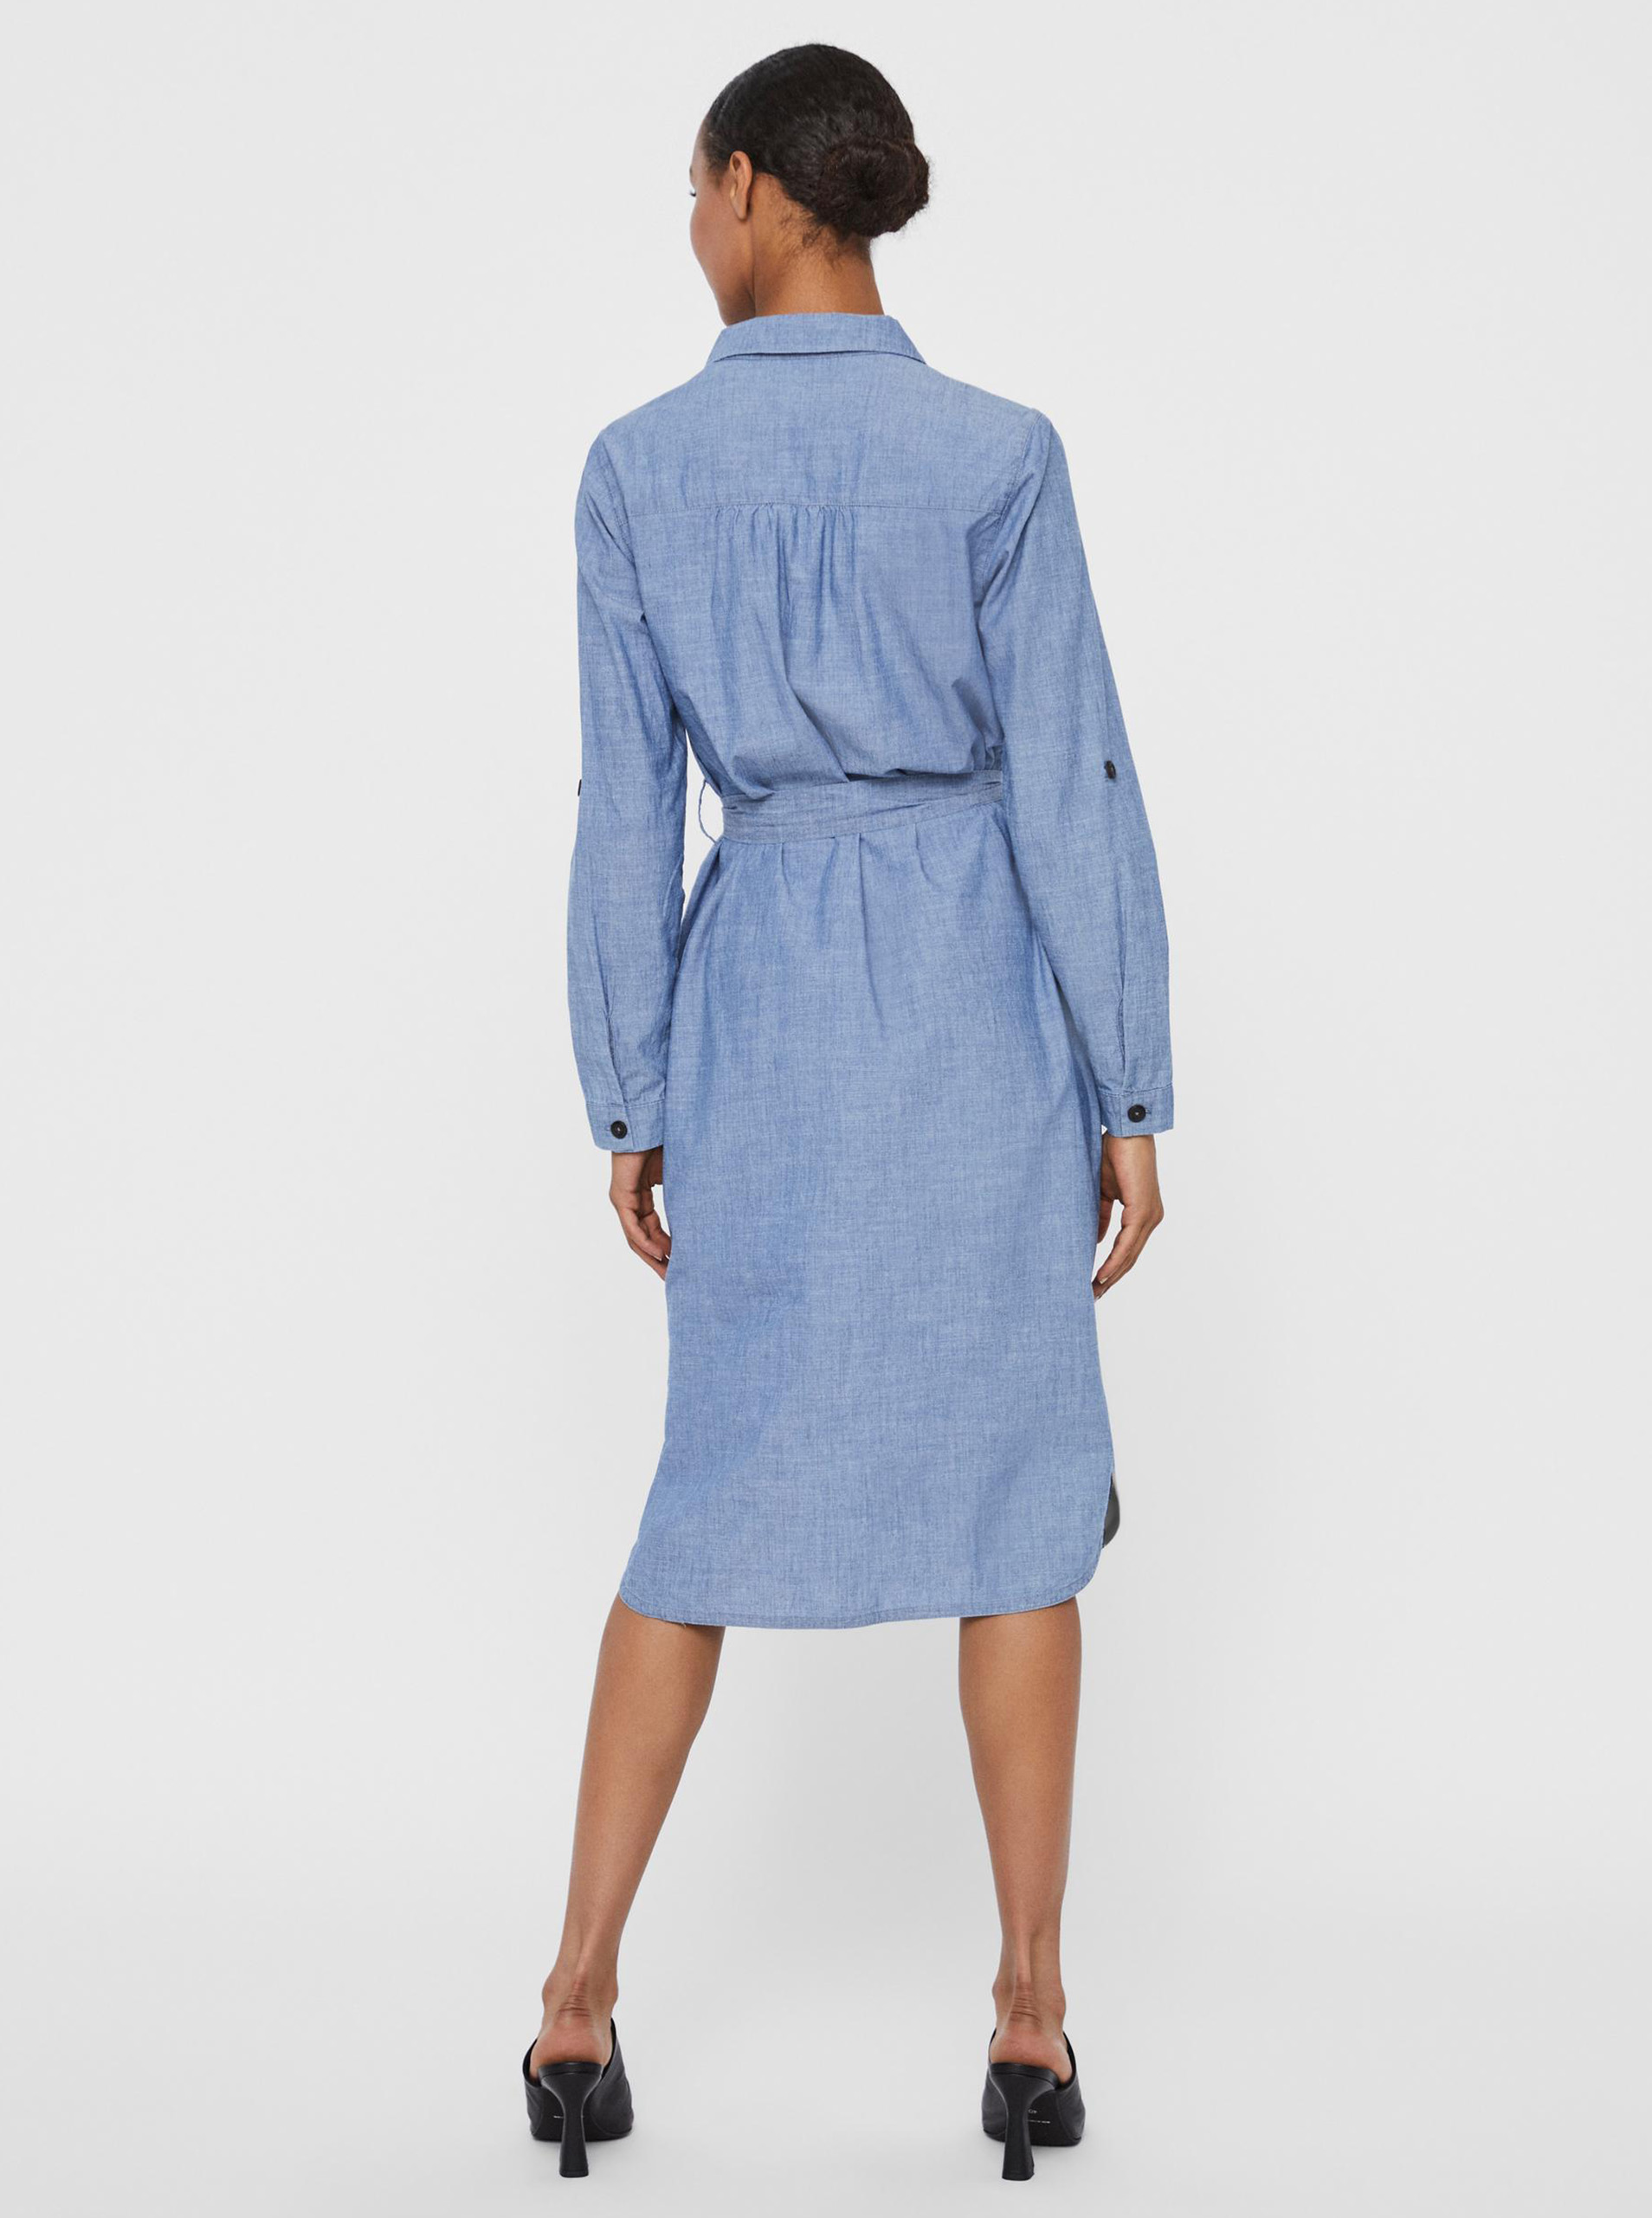 Vero Moda blue shirts dress Akela